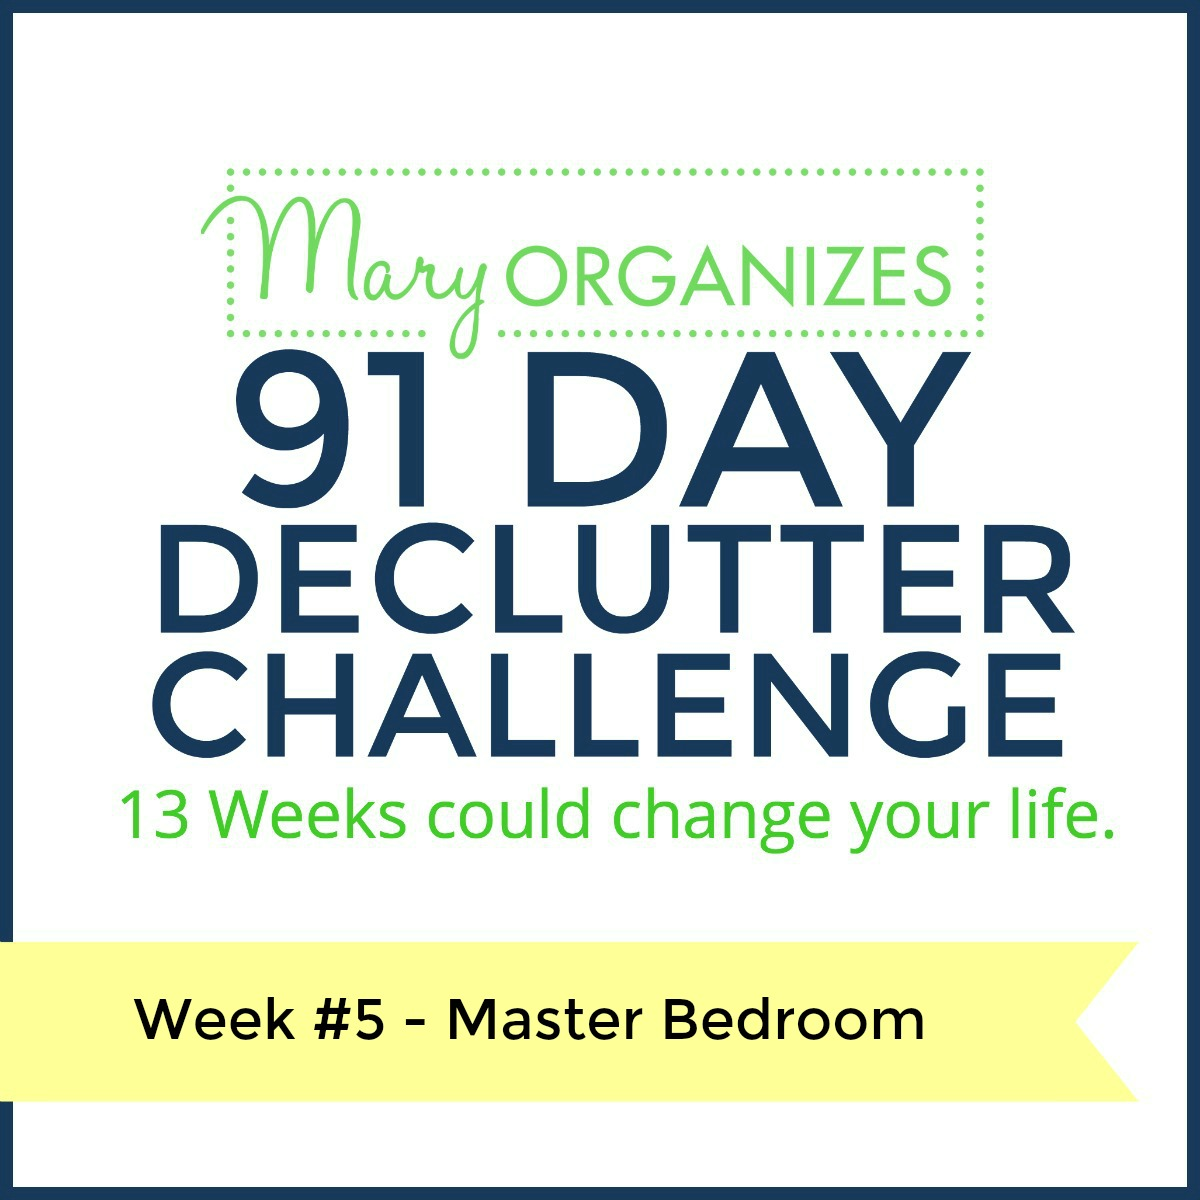 week-5-91-day-declutter-challenge-s